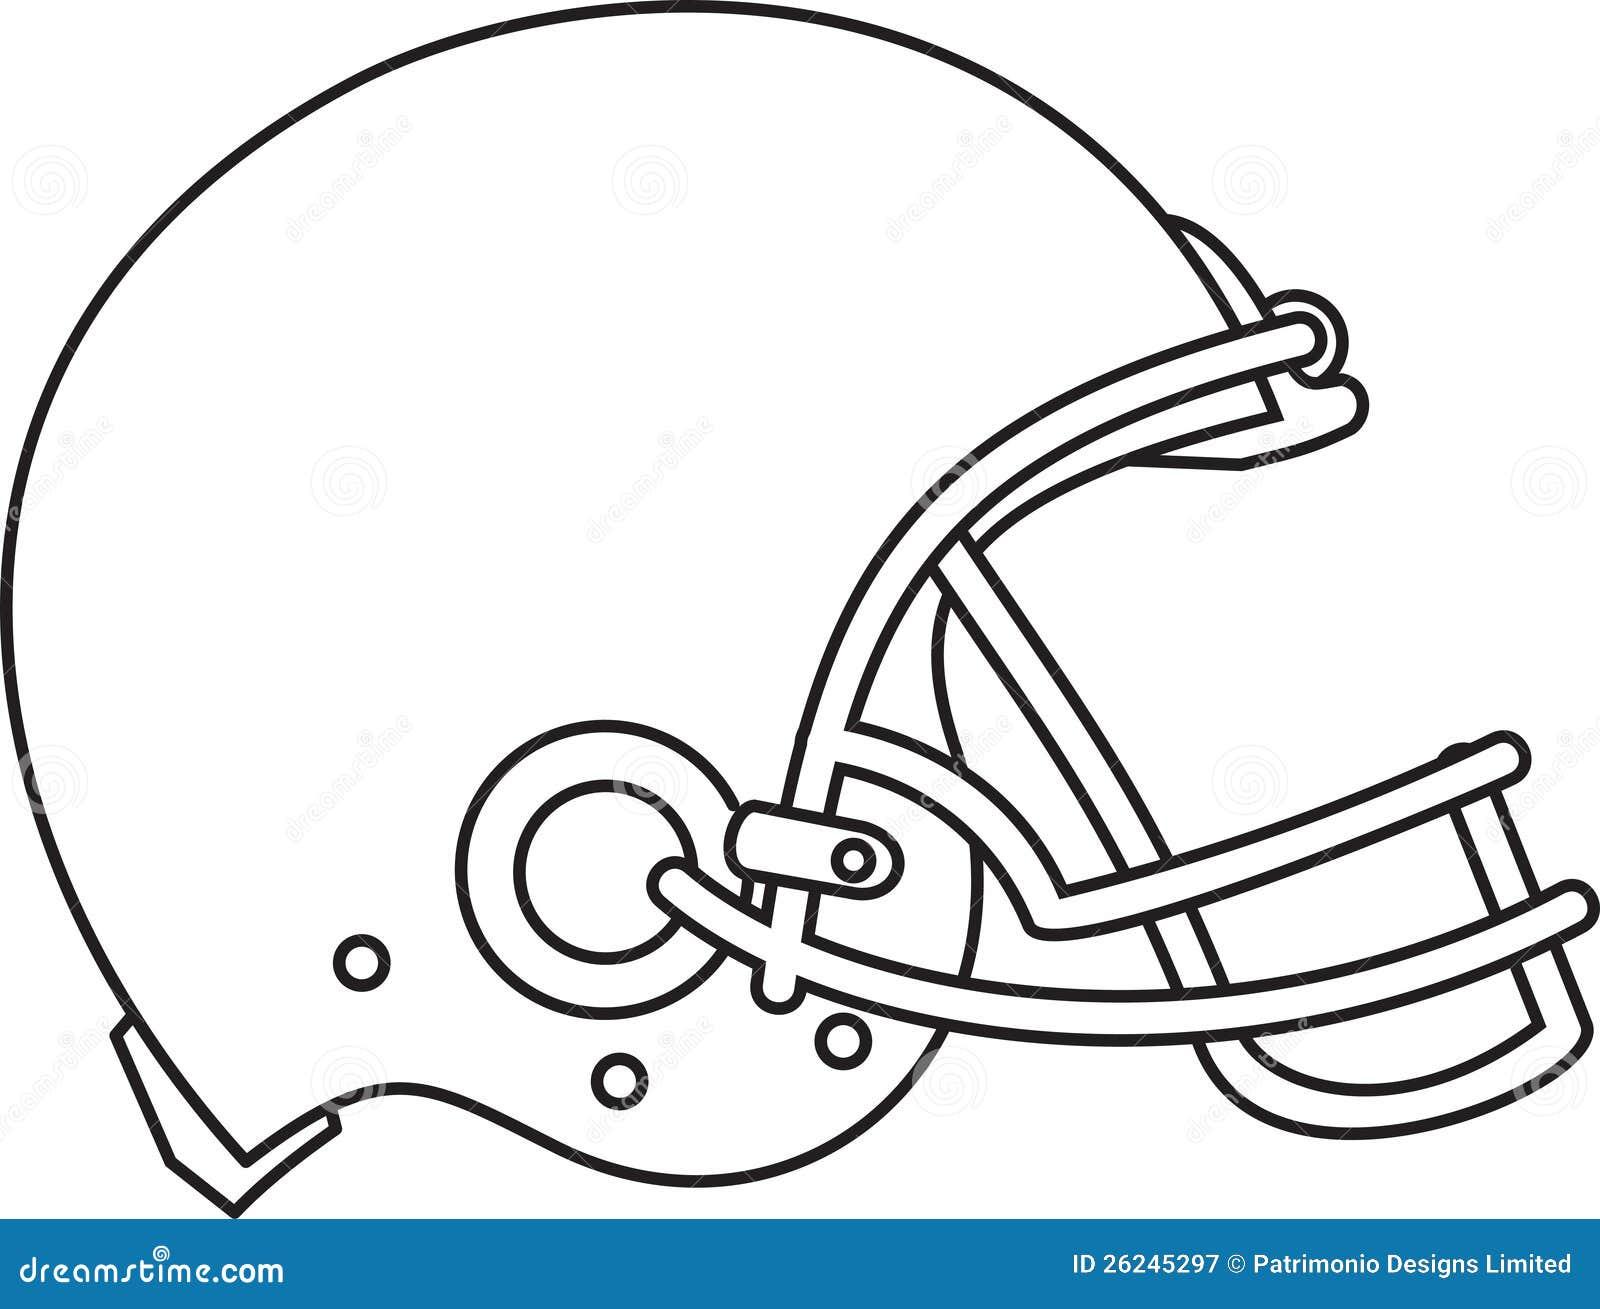 Line Art Ks : American football helmet line drawing stock vector